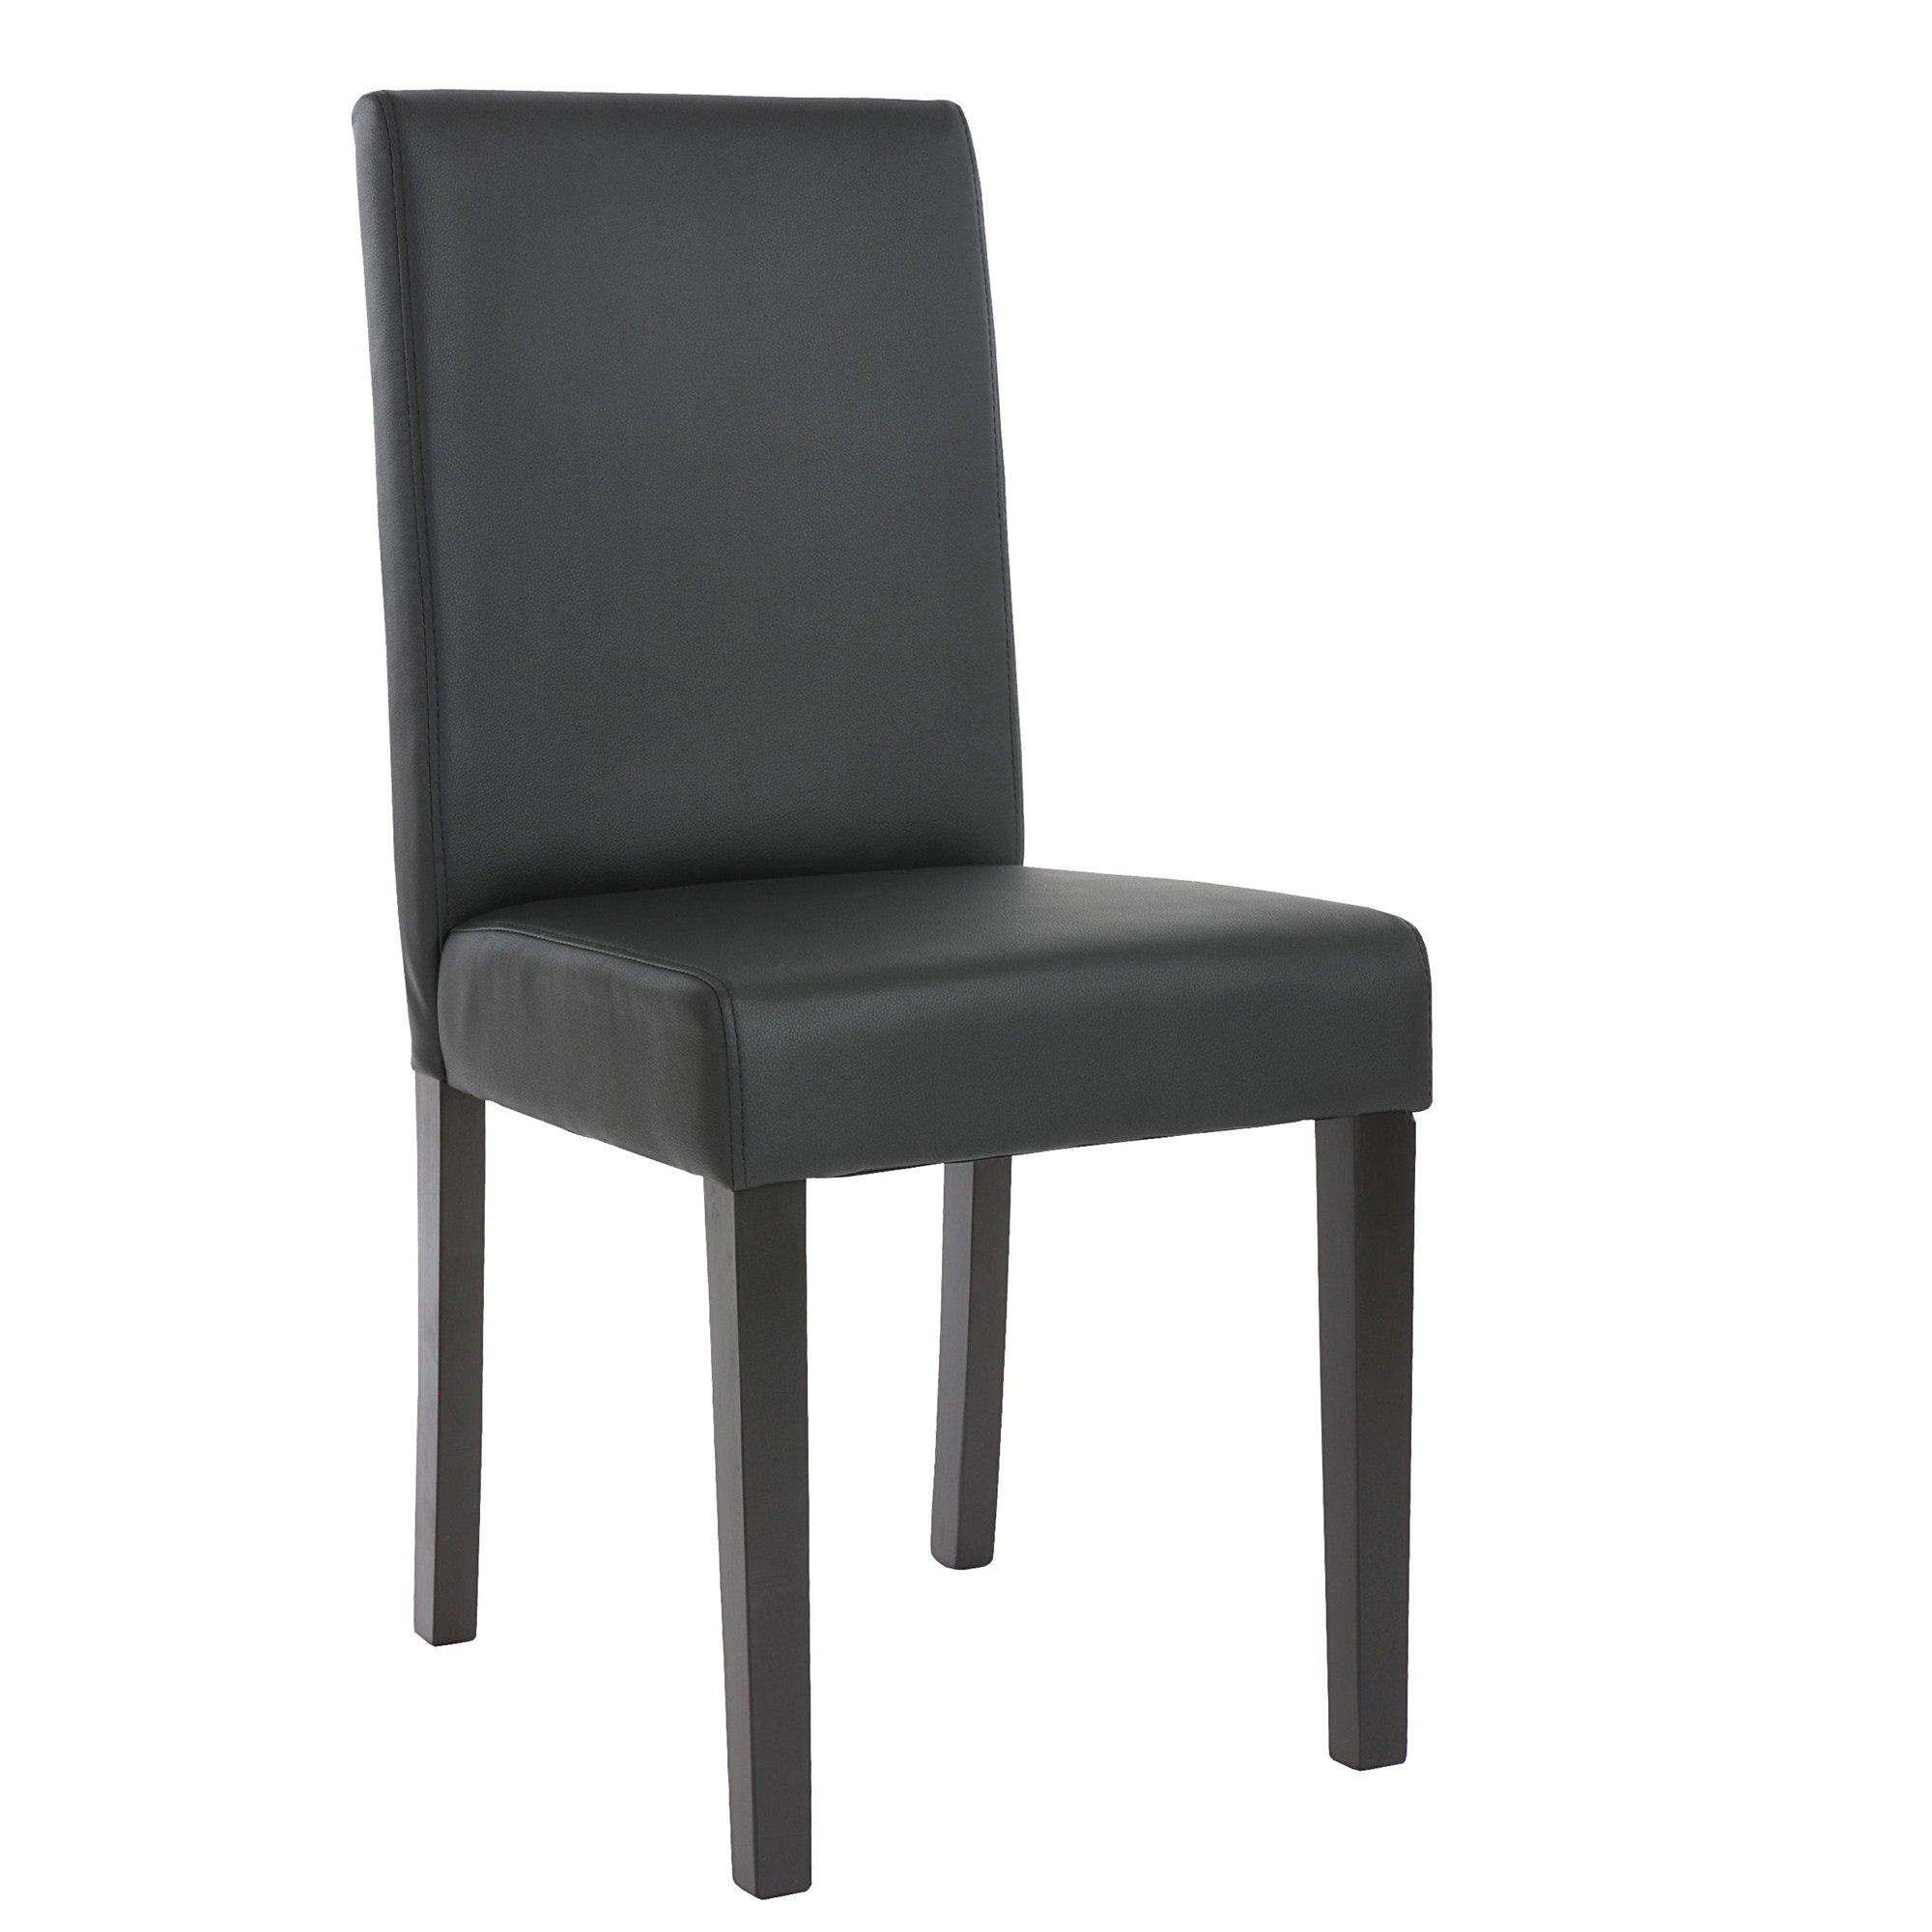 Lote 4 sillas de comedor litau piel mate negra lote 4 for Sillas de comedor tapizadas en piel